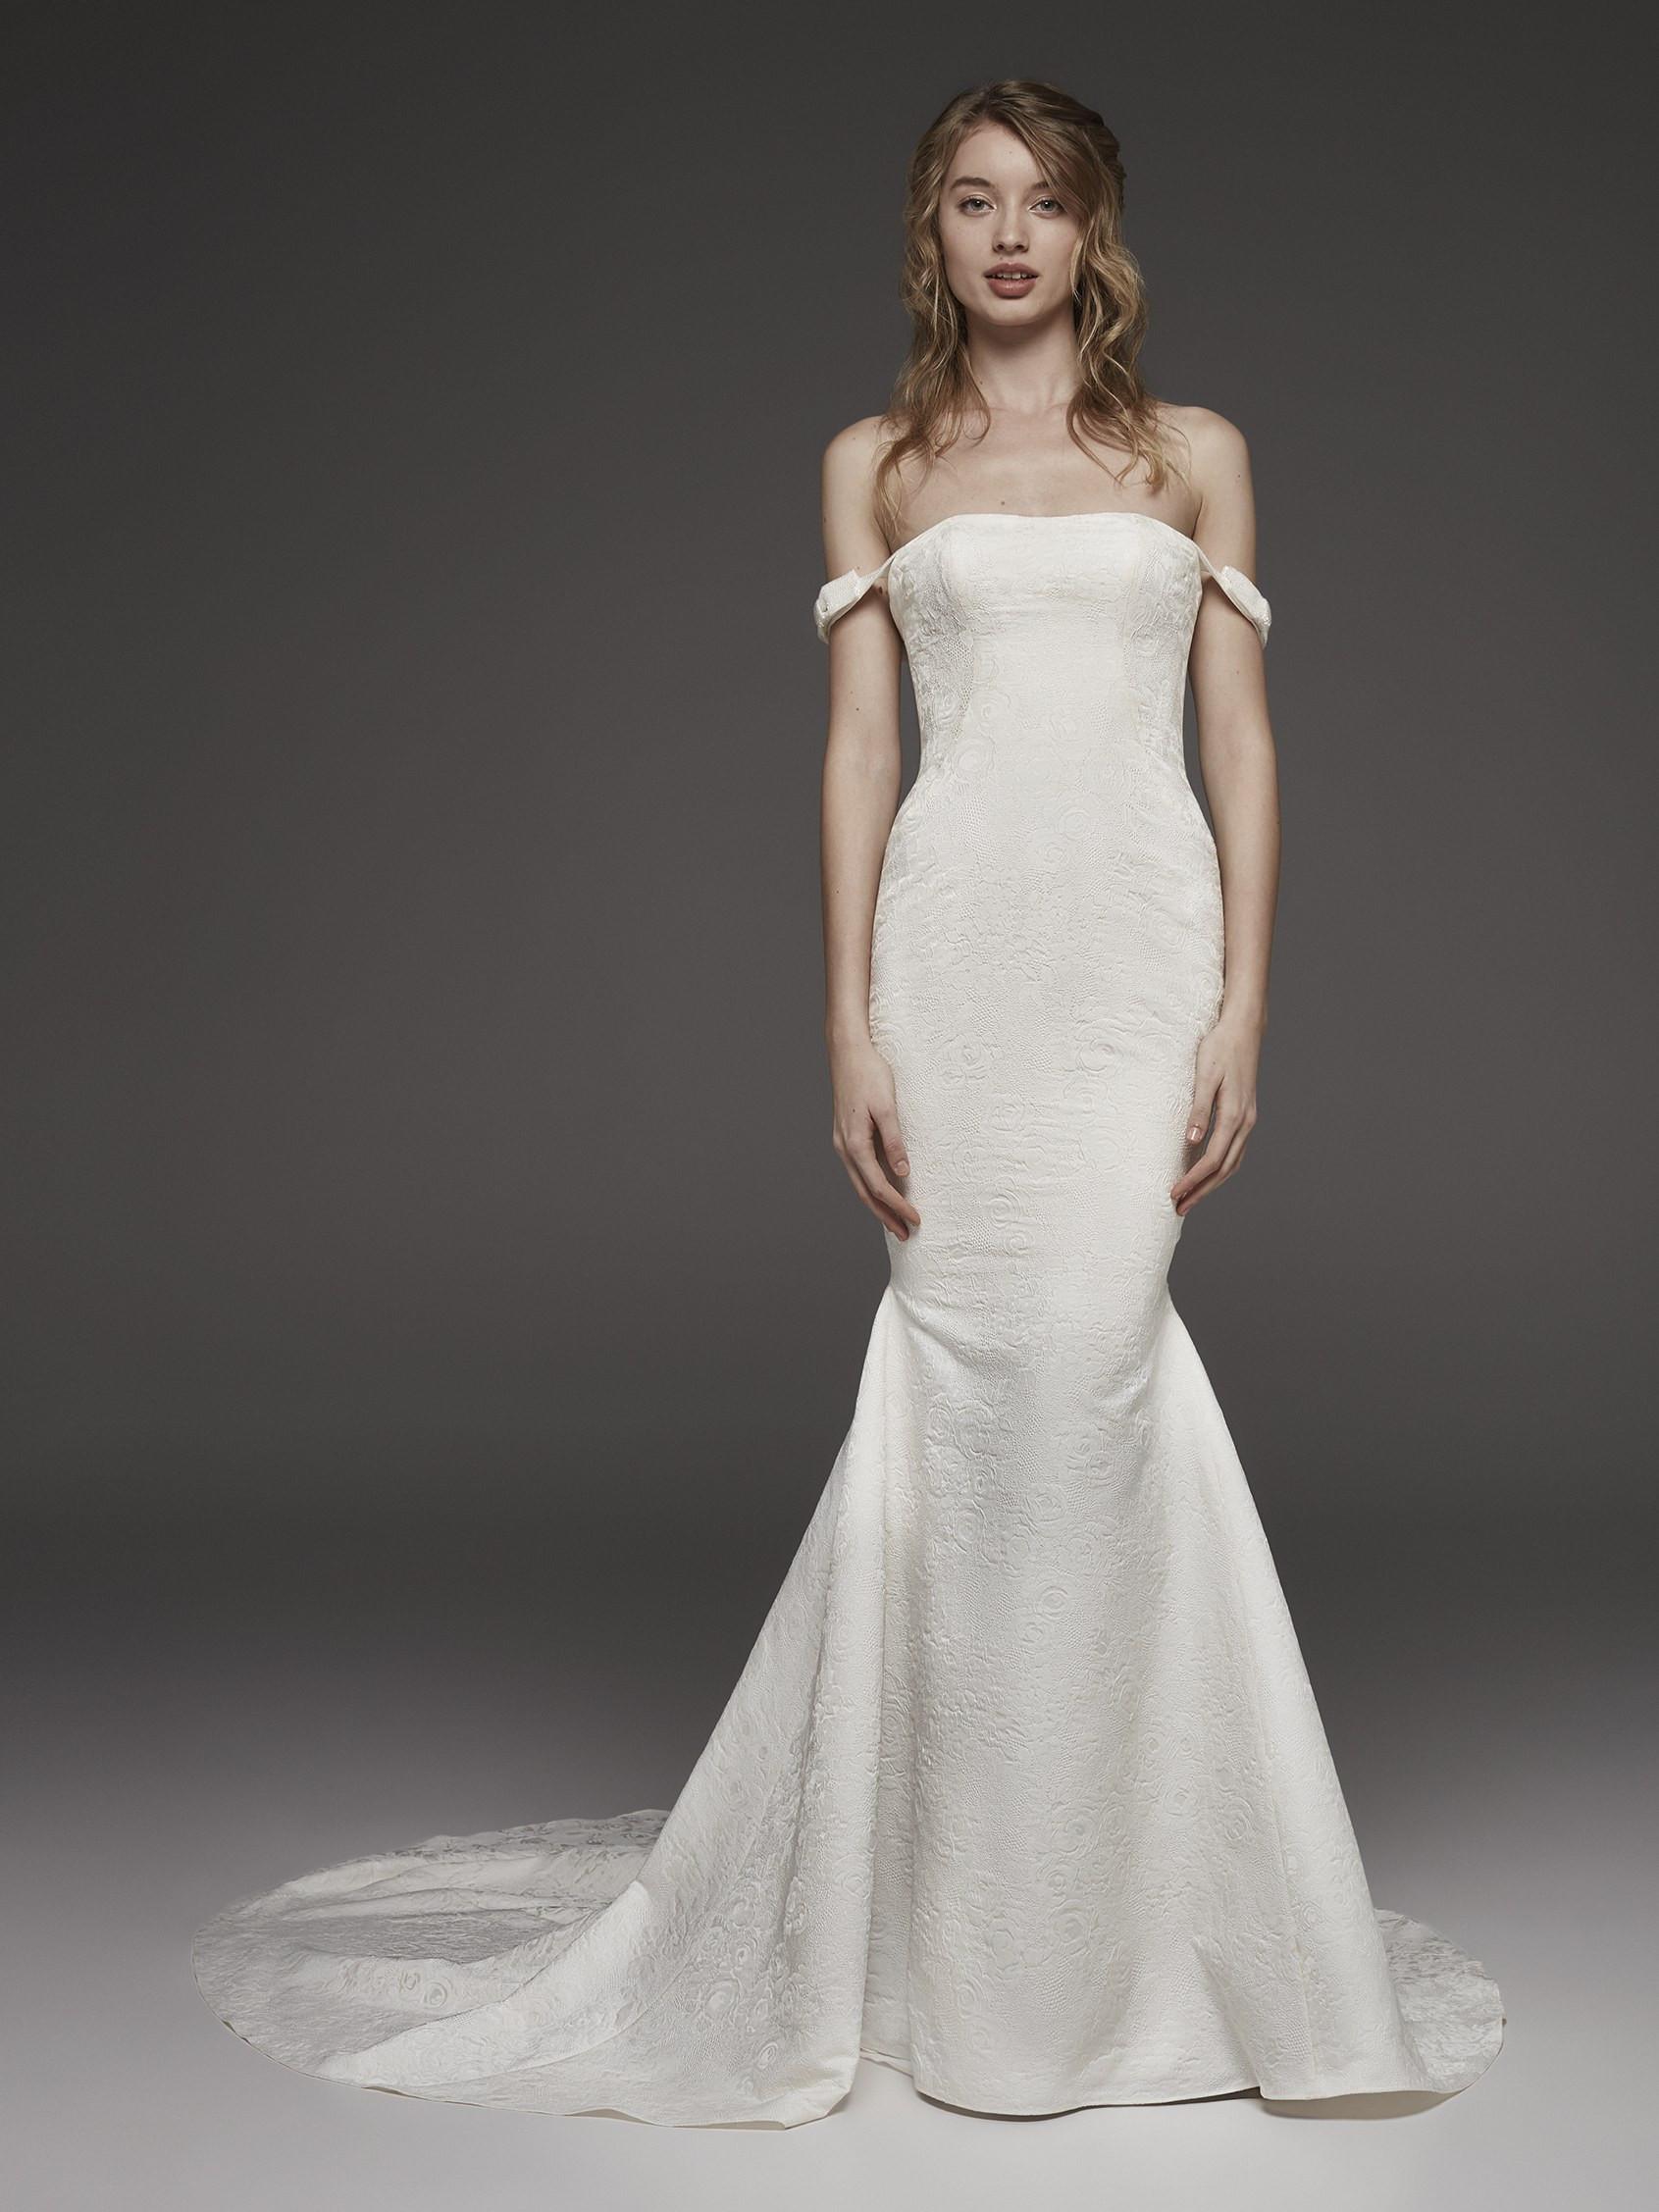 Mira Couture Atelier Pronovias Helvetia Wedding Dress Bridal Gown Chicago Boutique Front